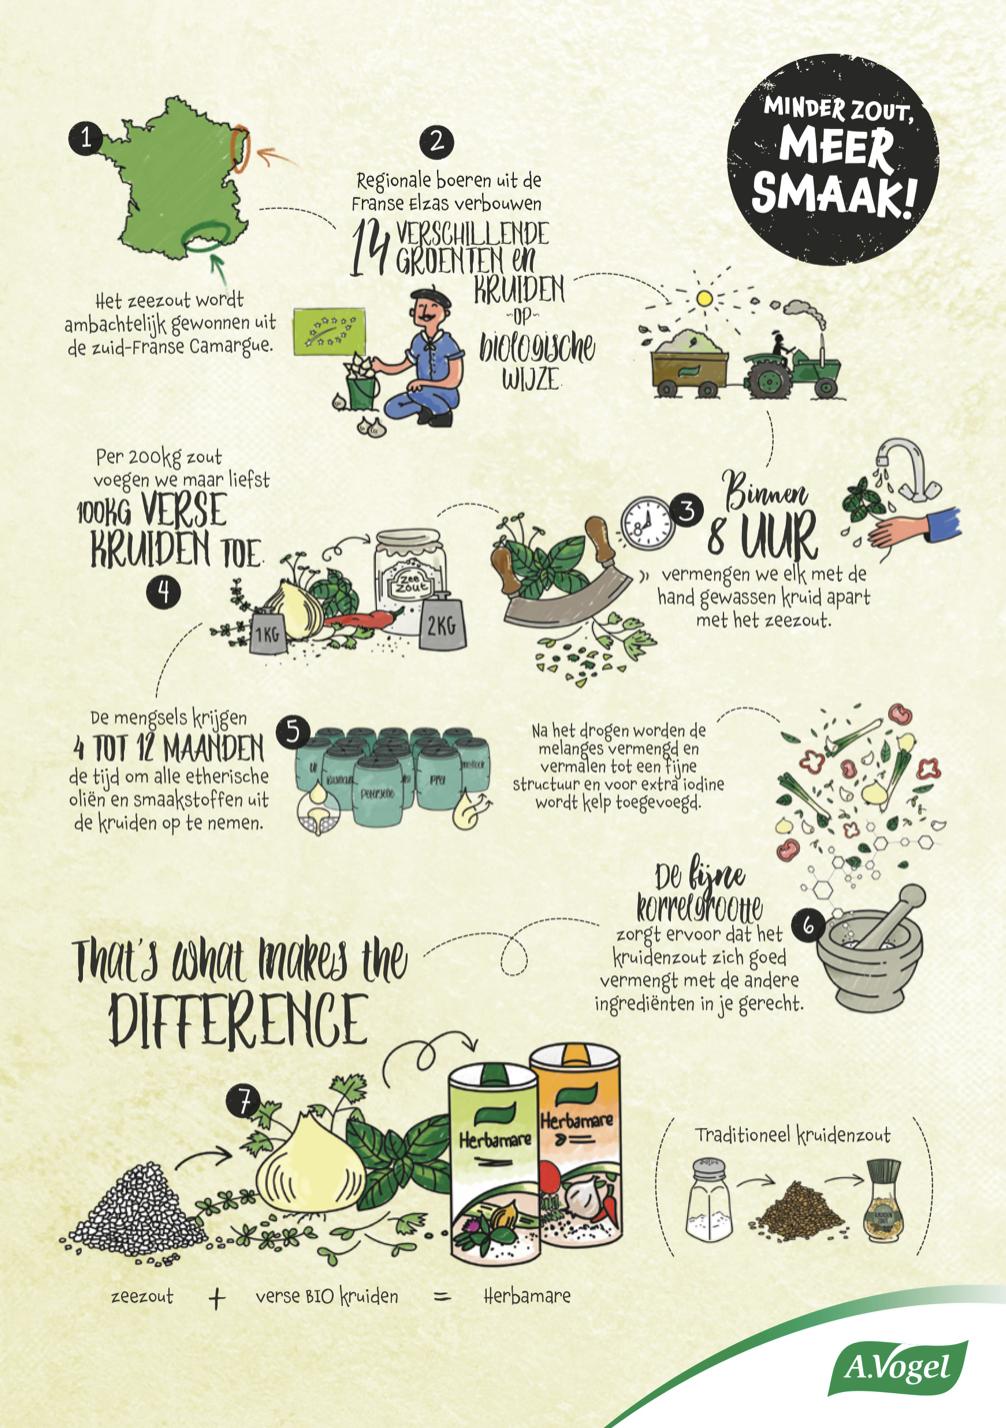 Koken met Biologisch Herbamare KruidenzoutSchema 'The Lemon Kitchen